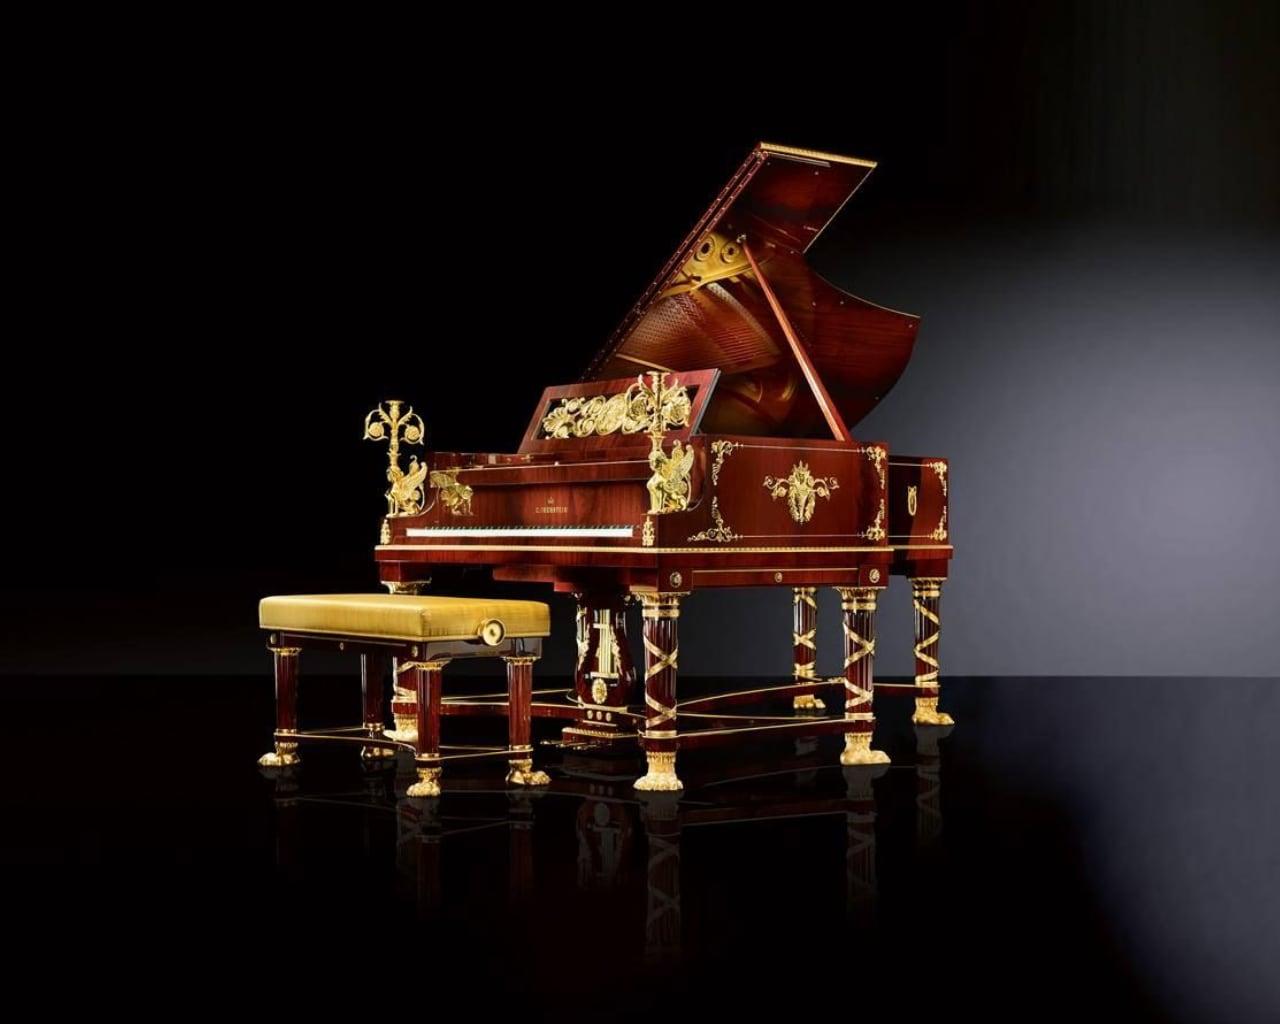 C. Bechstein Sphinx piano